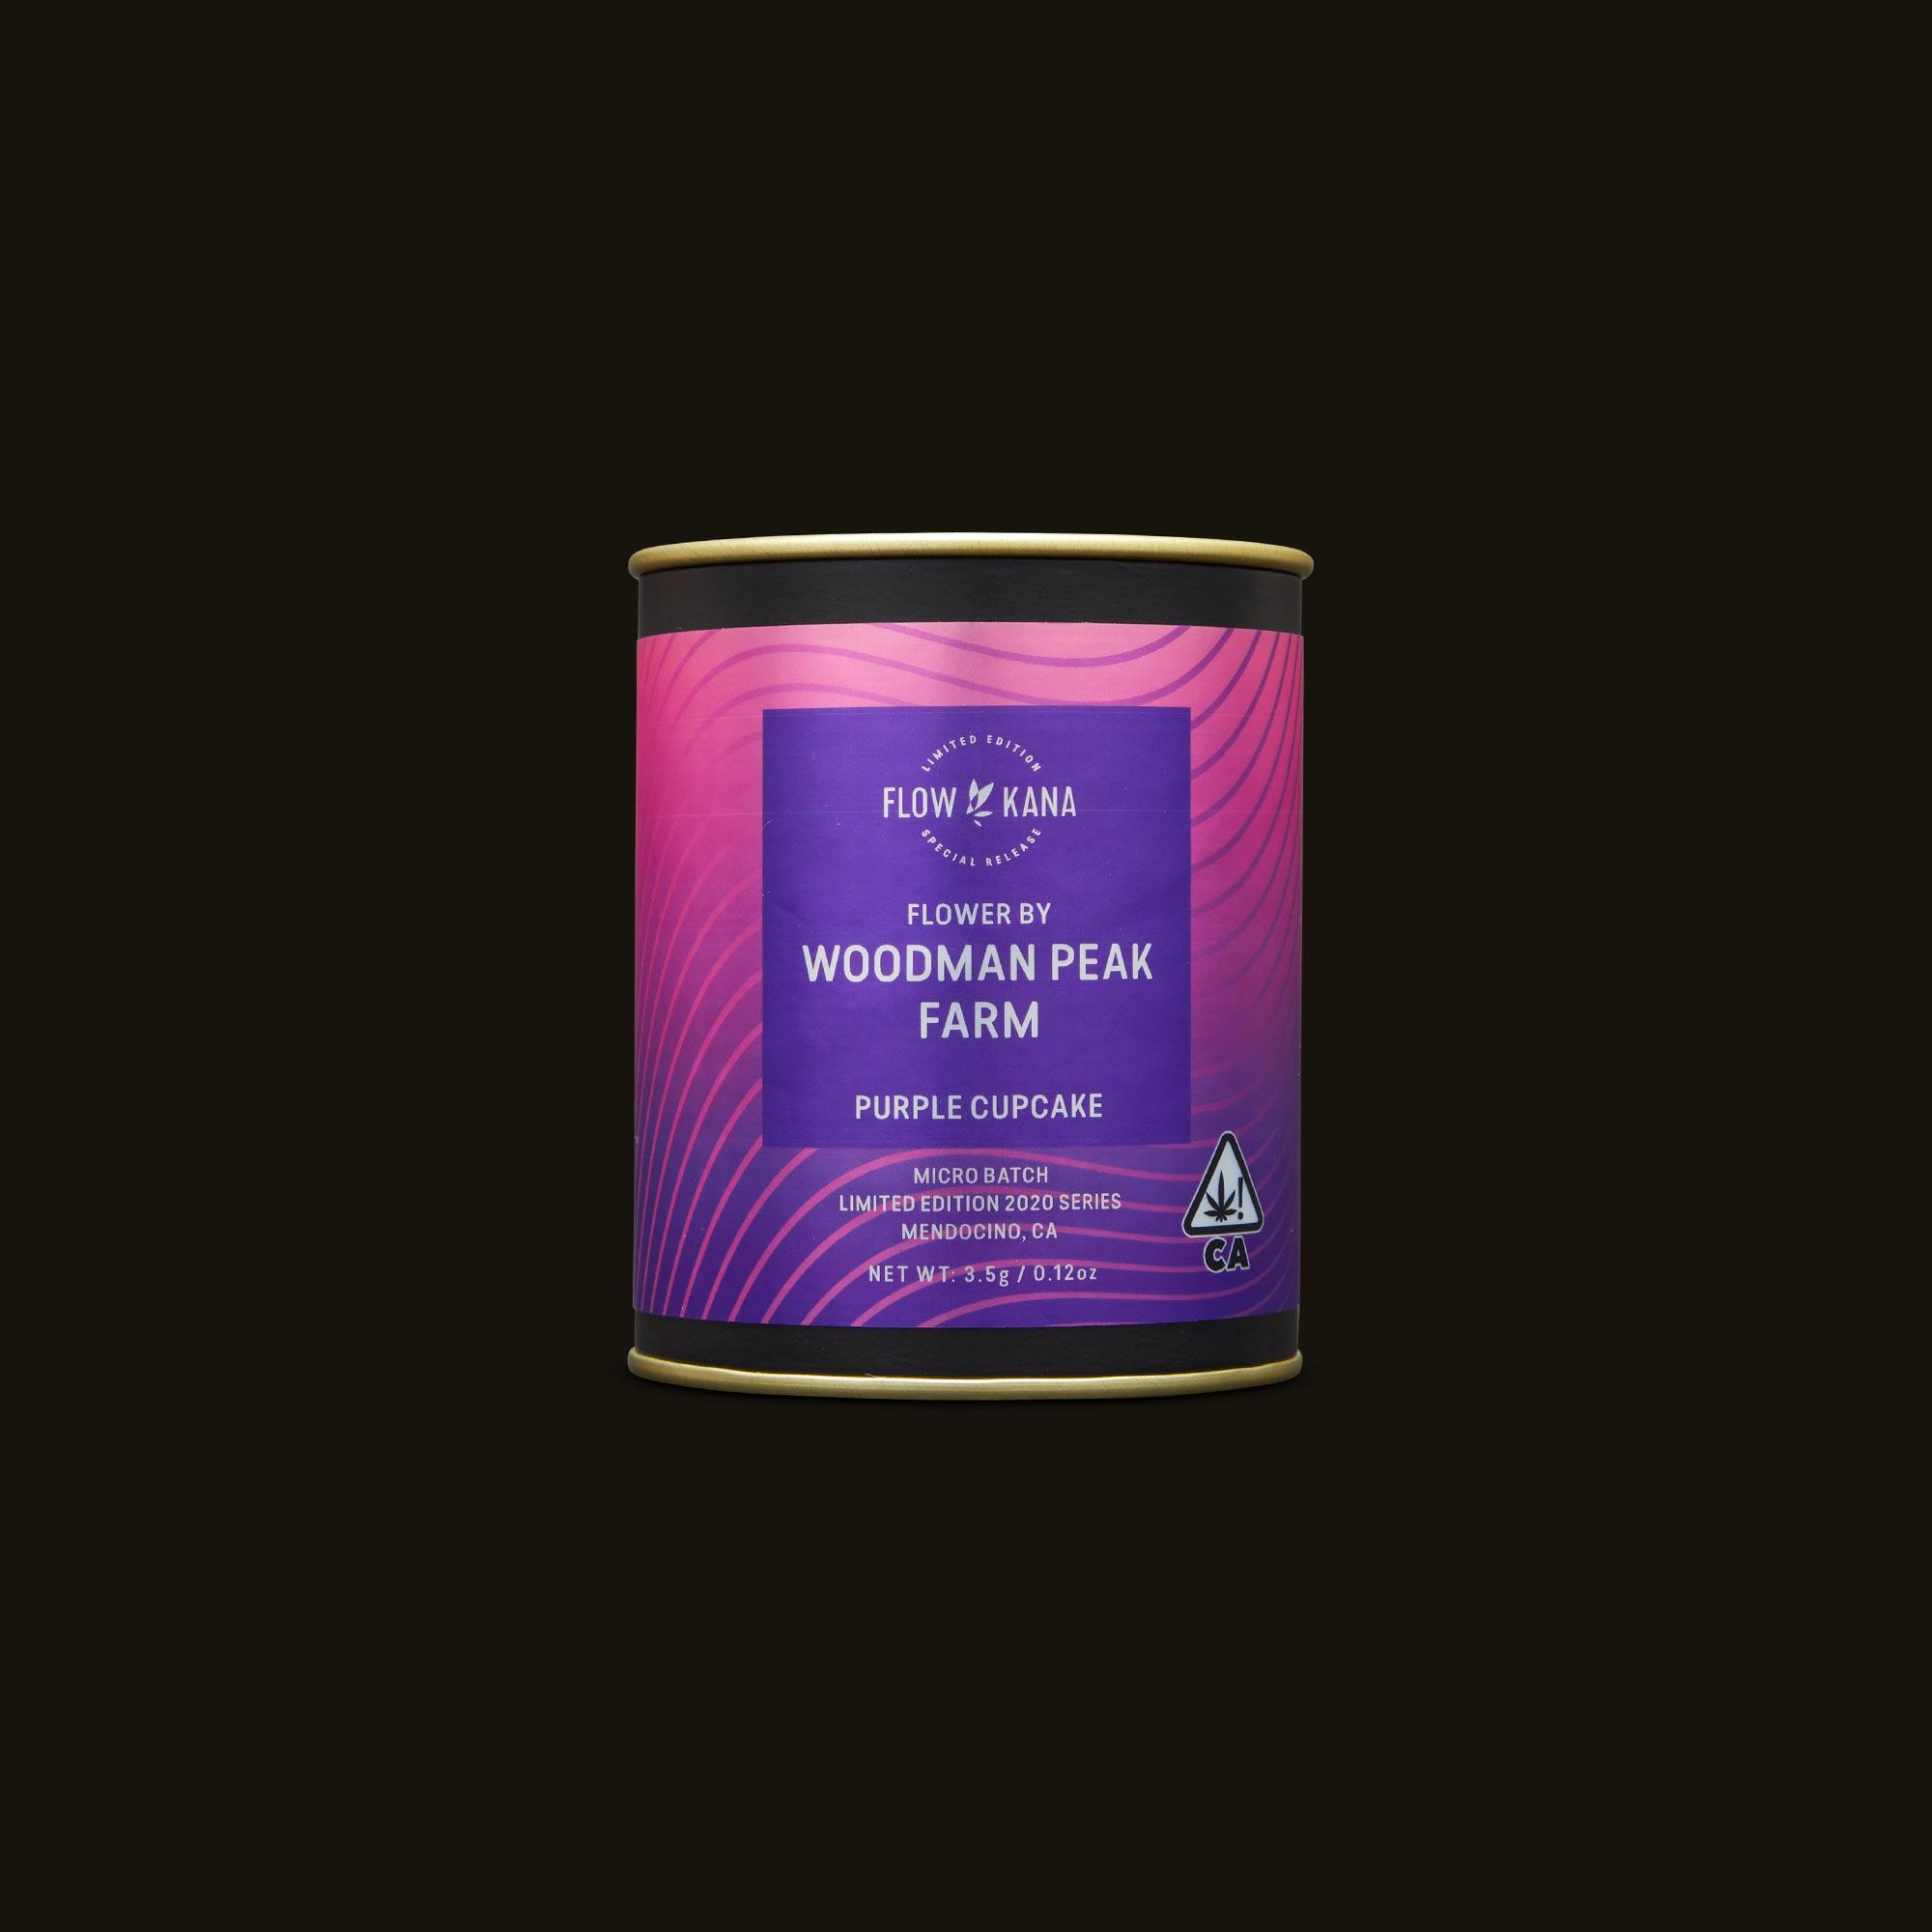 Flow Kana Purple Cupcake Packaging